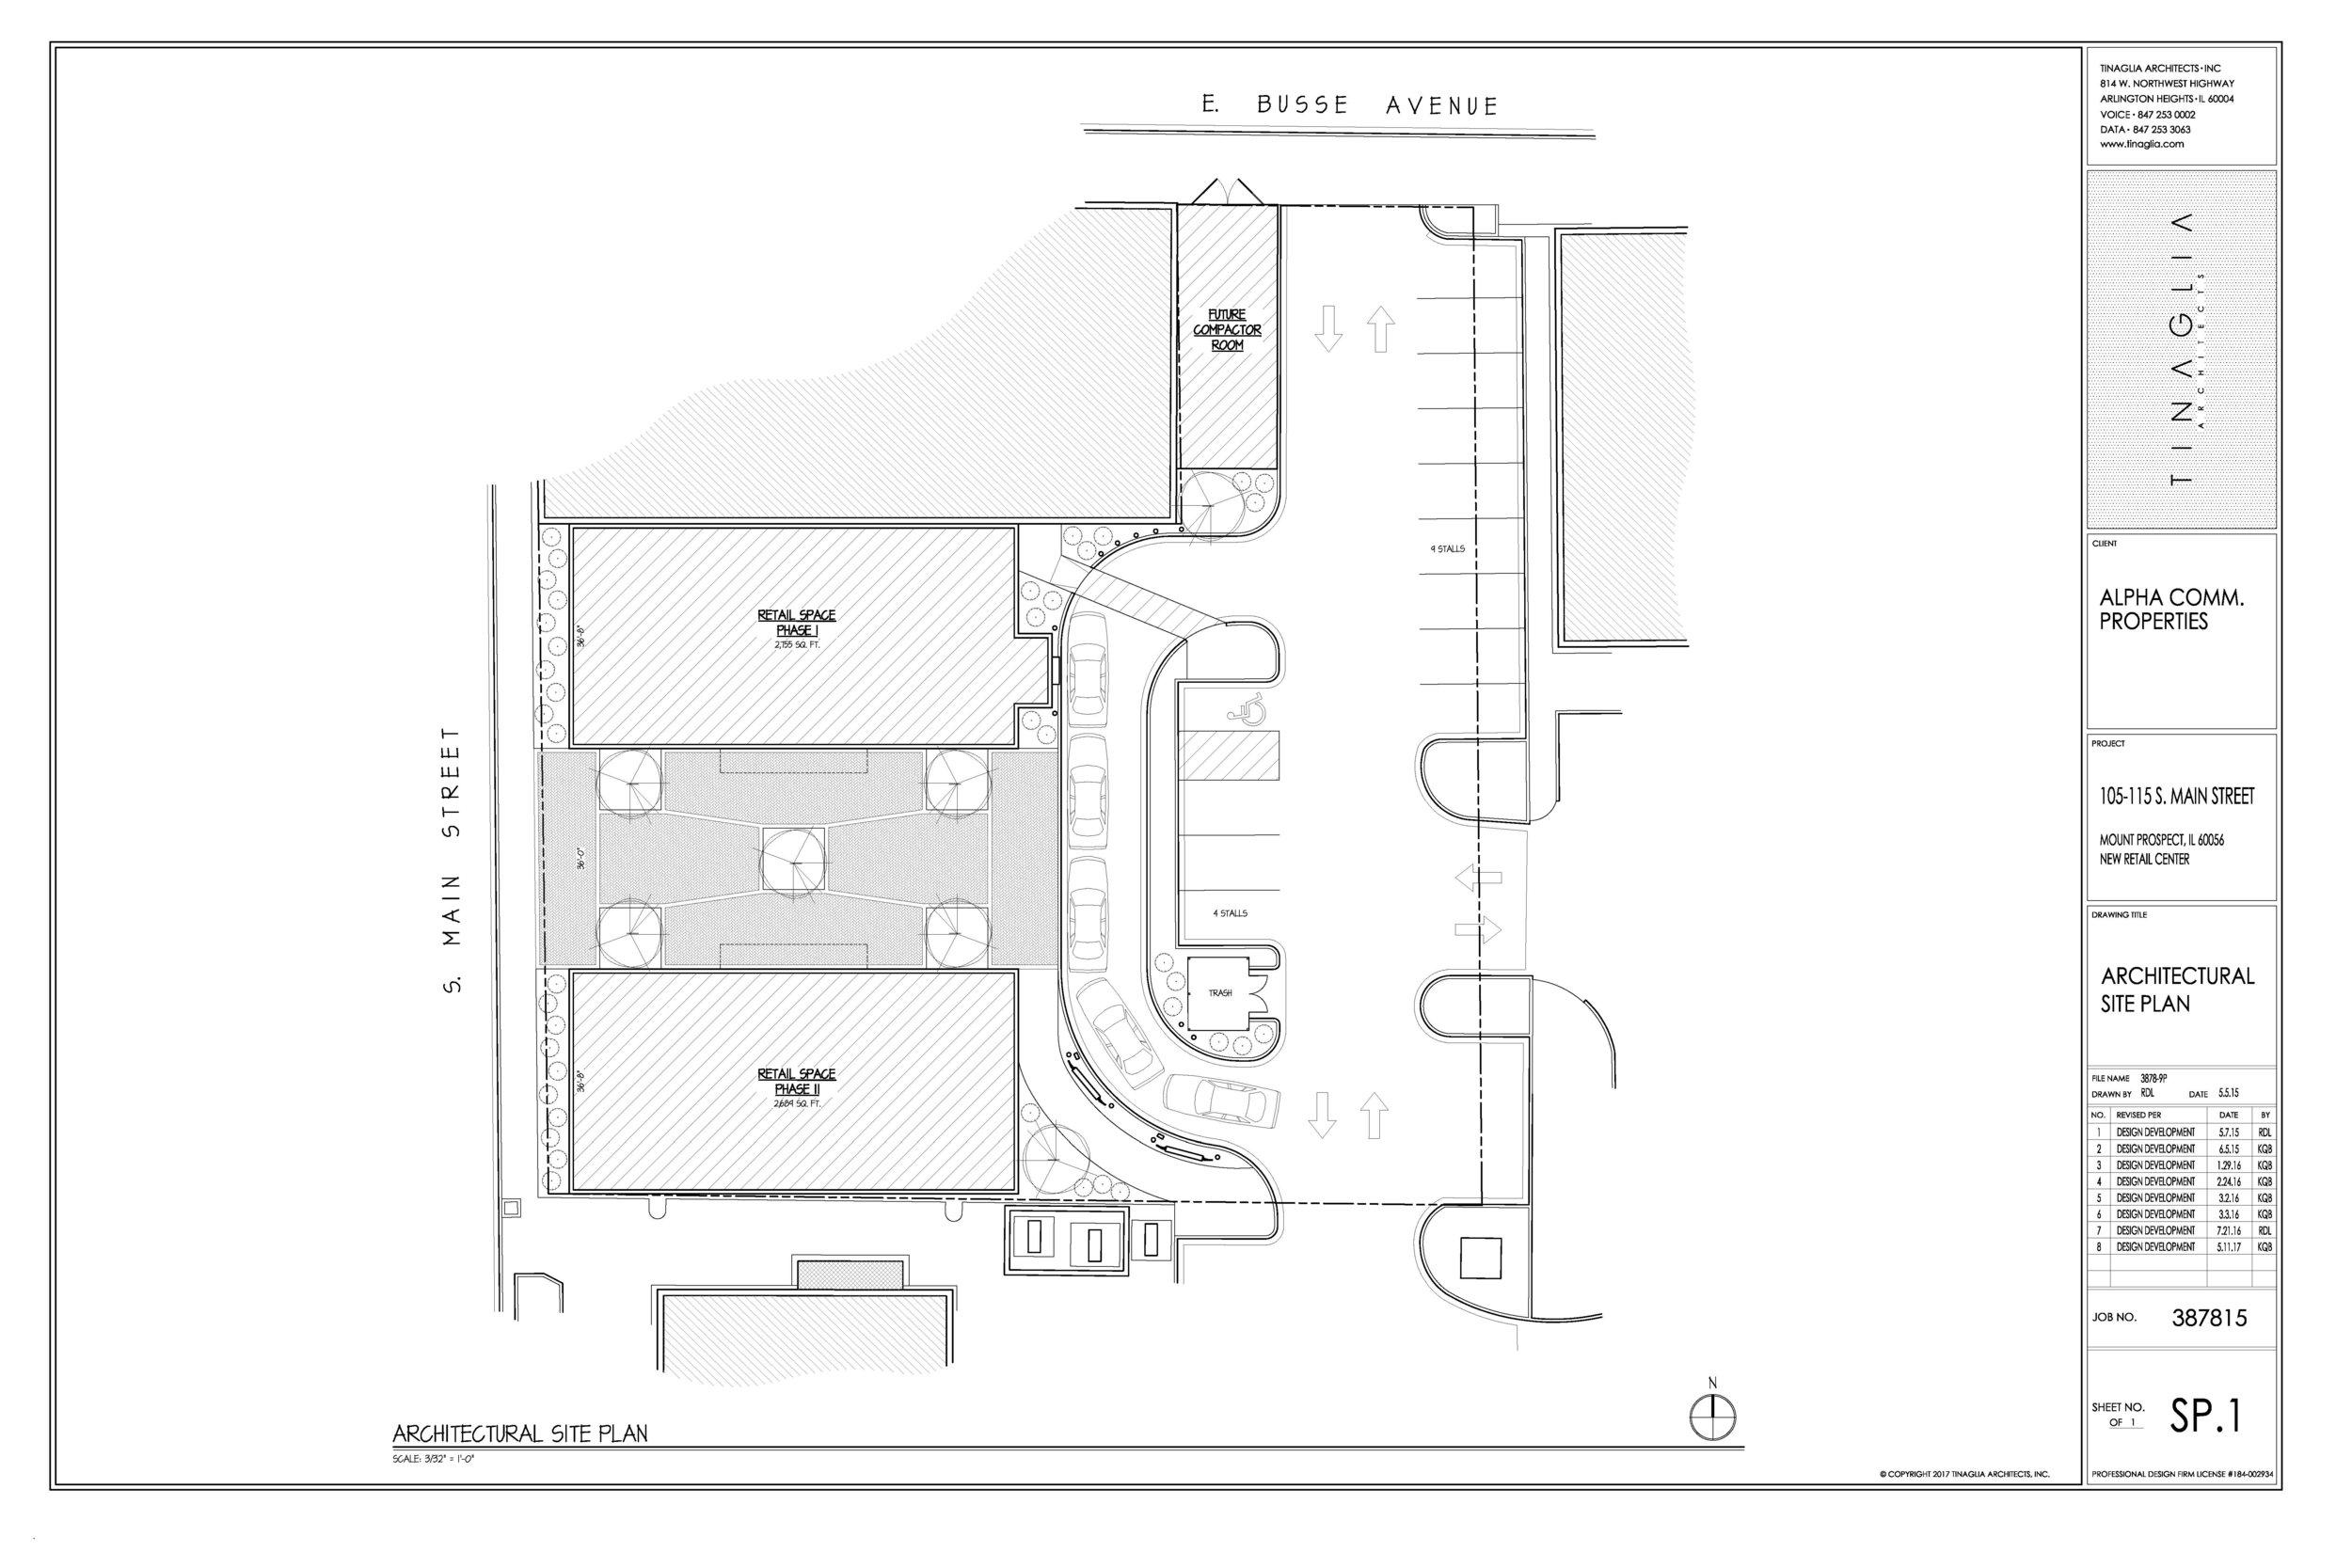 105-115 S Main St Drive-Thru Site Plan 5-16-17.jpg